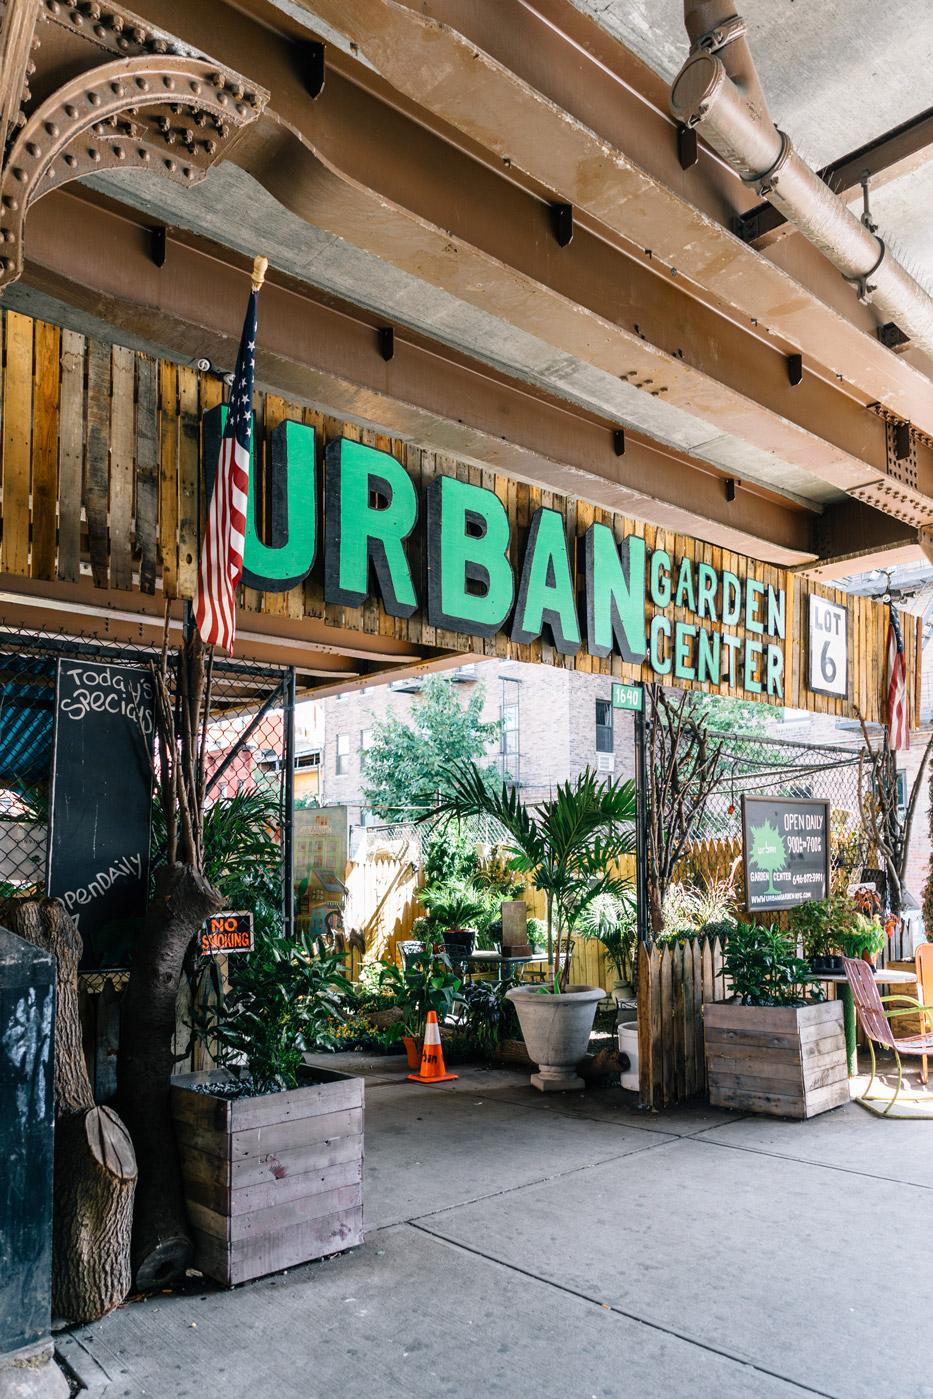 Urban Garden Center in East Harlem